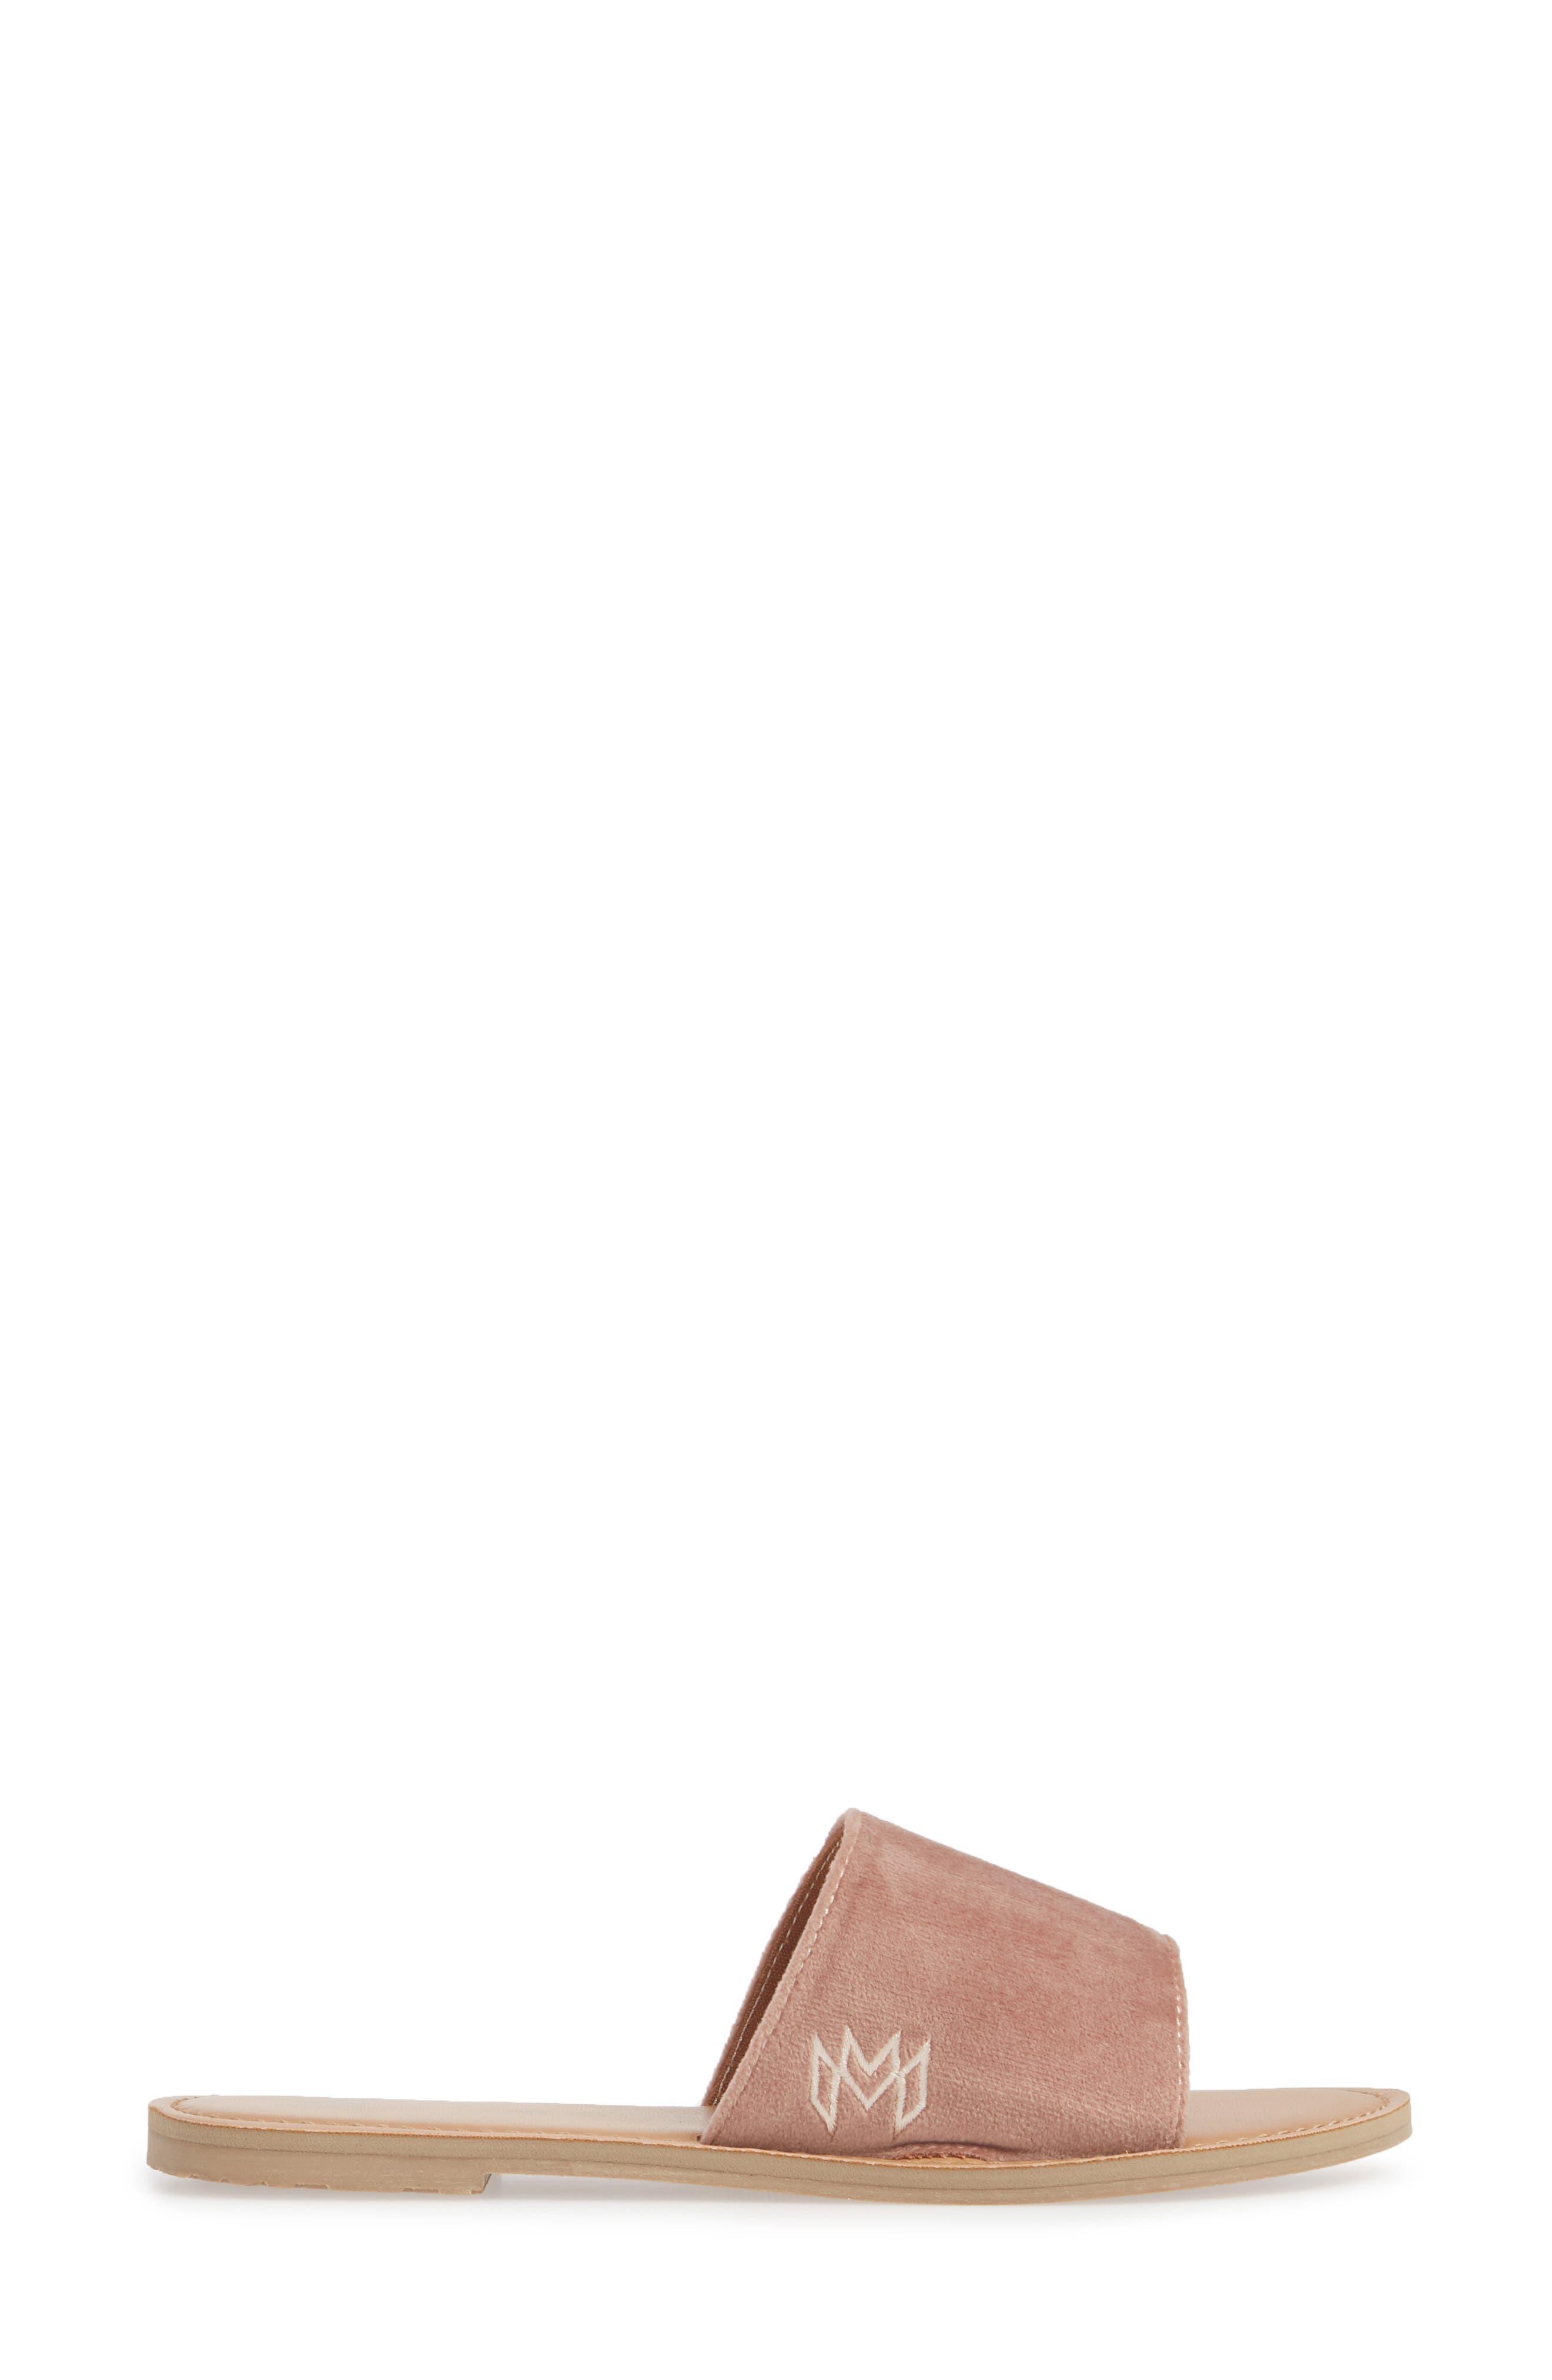 MALVADOS, Icon Taylor Plush Slide Sandal, Alternate thumbnail 3, color, COGNAC